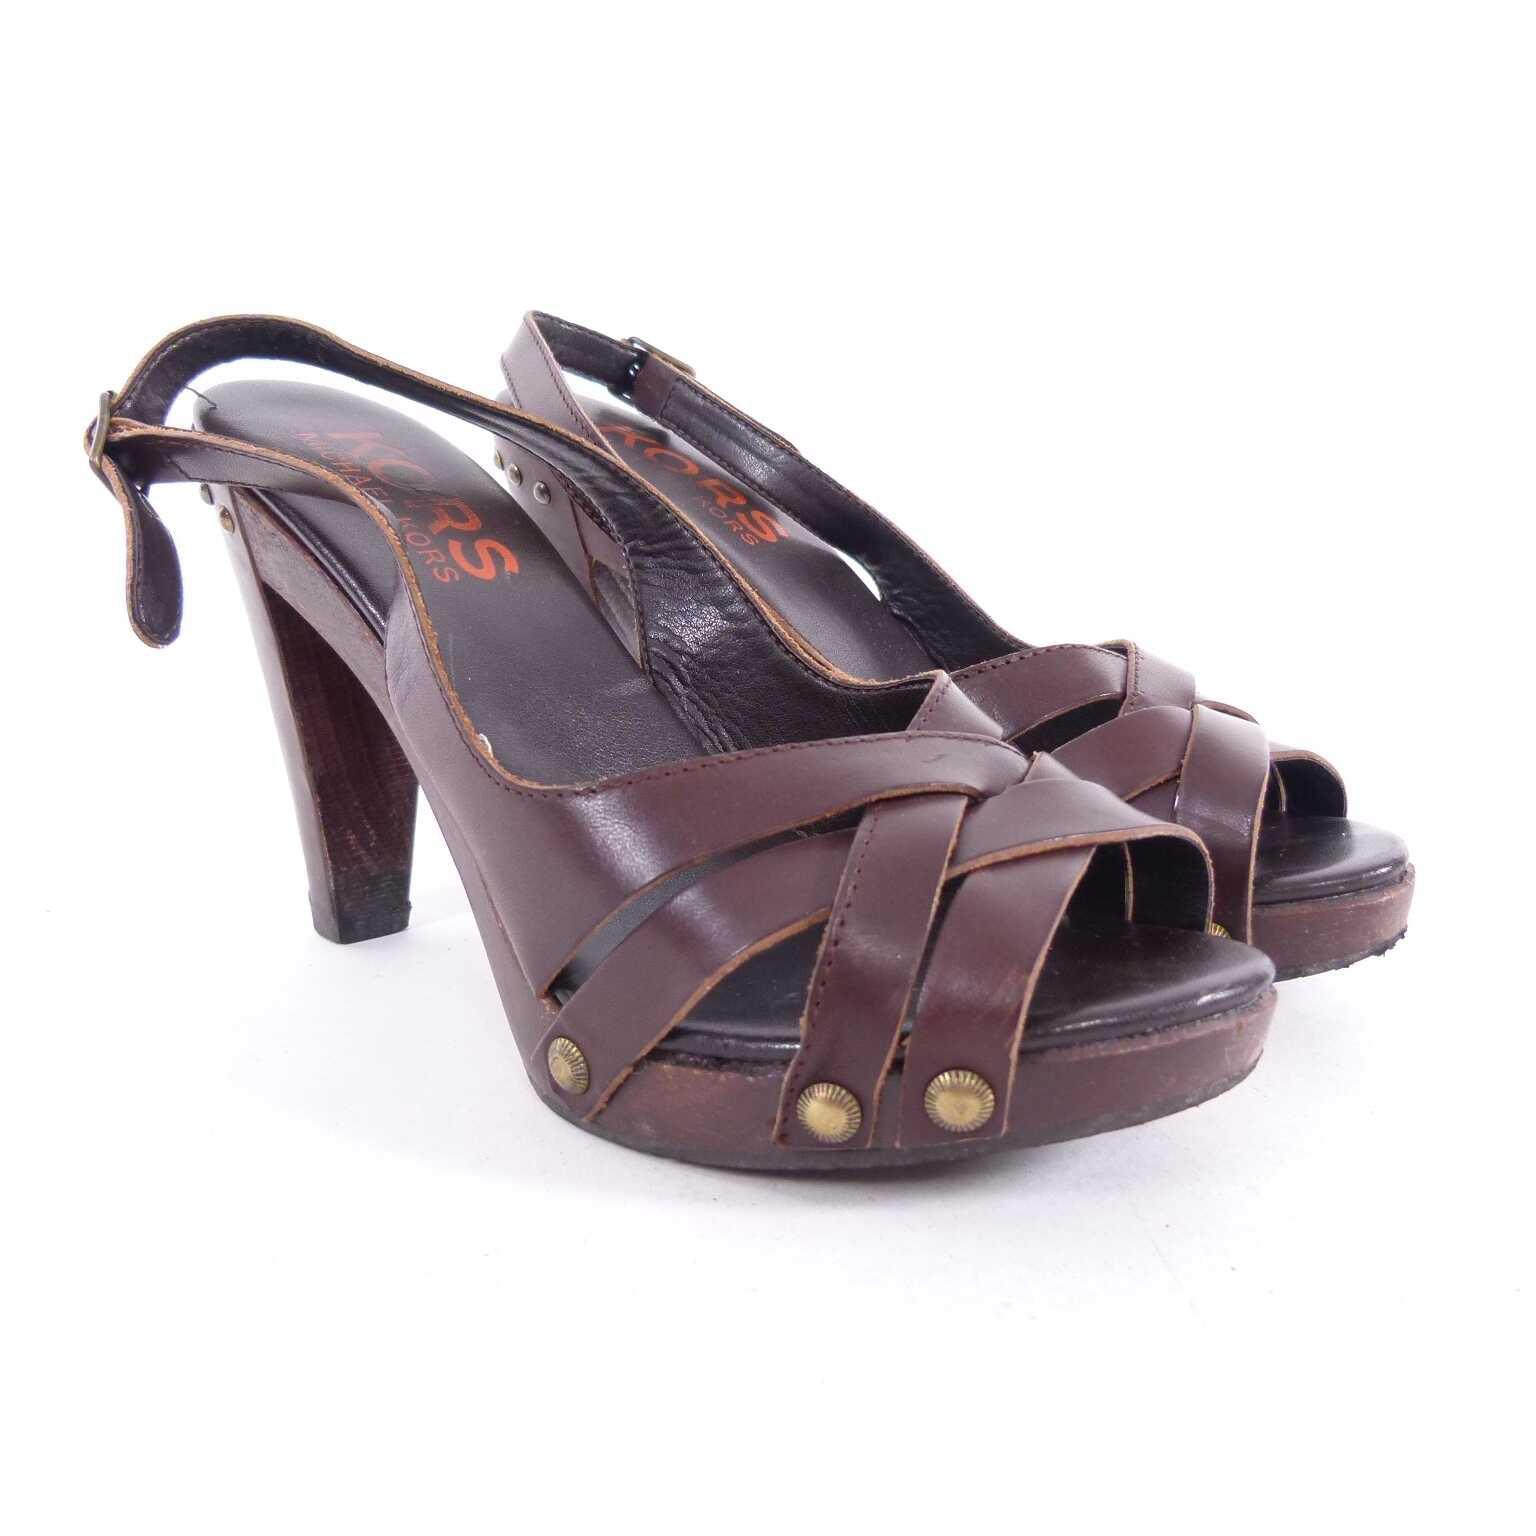 michael kors holz riemchen sandalette schuhe gr 37 in braun muc women schuhe. Black Bedroom Furniture Sets. Home Design Ideas